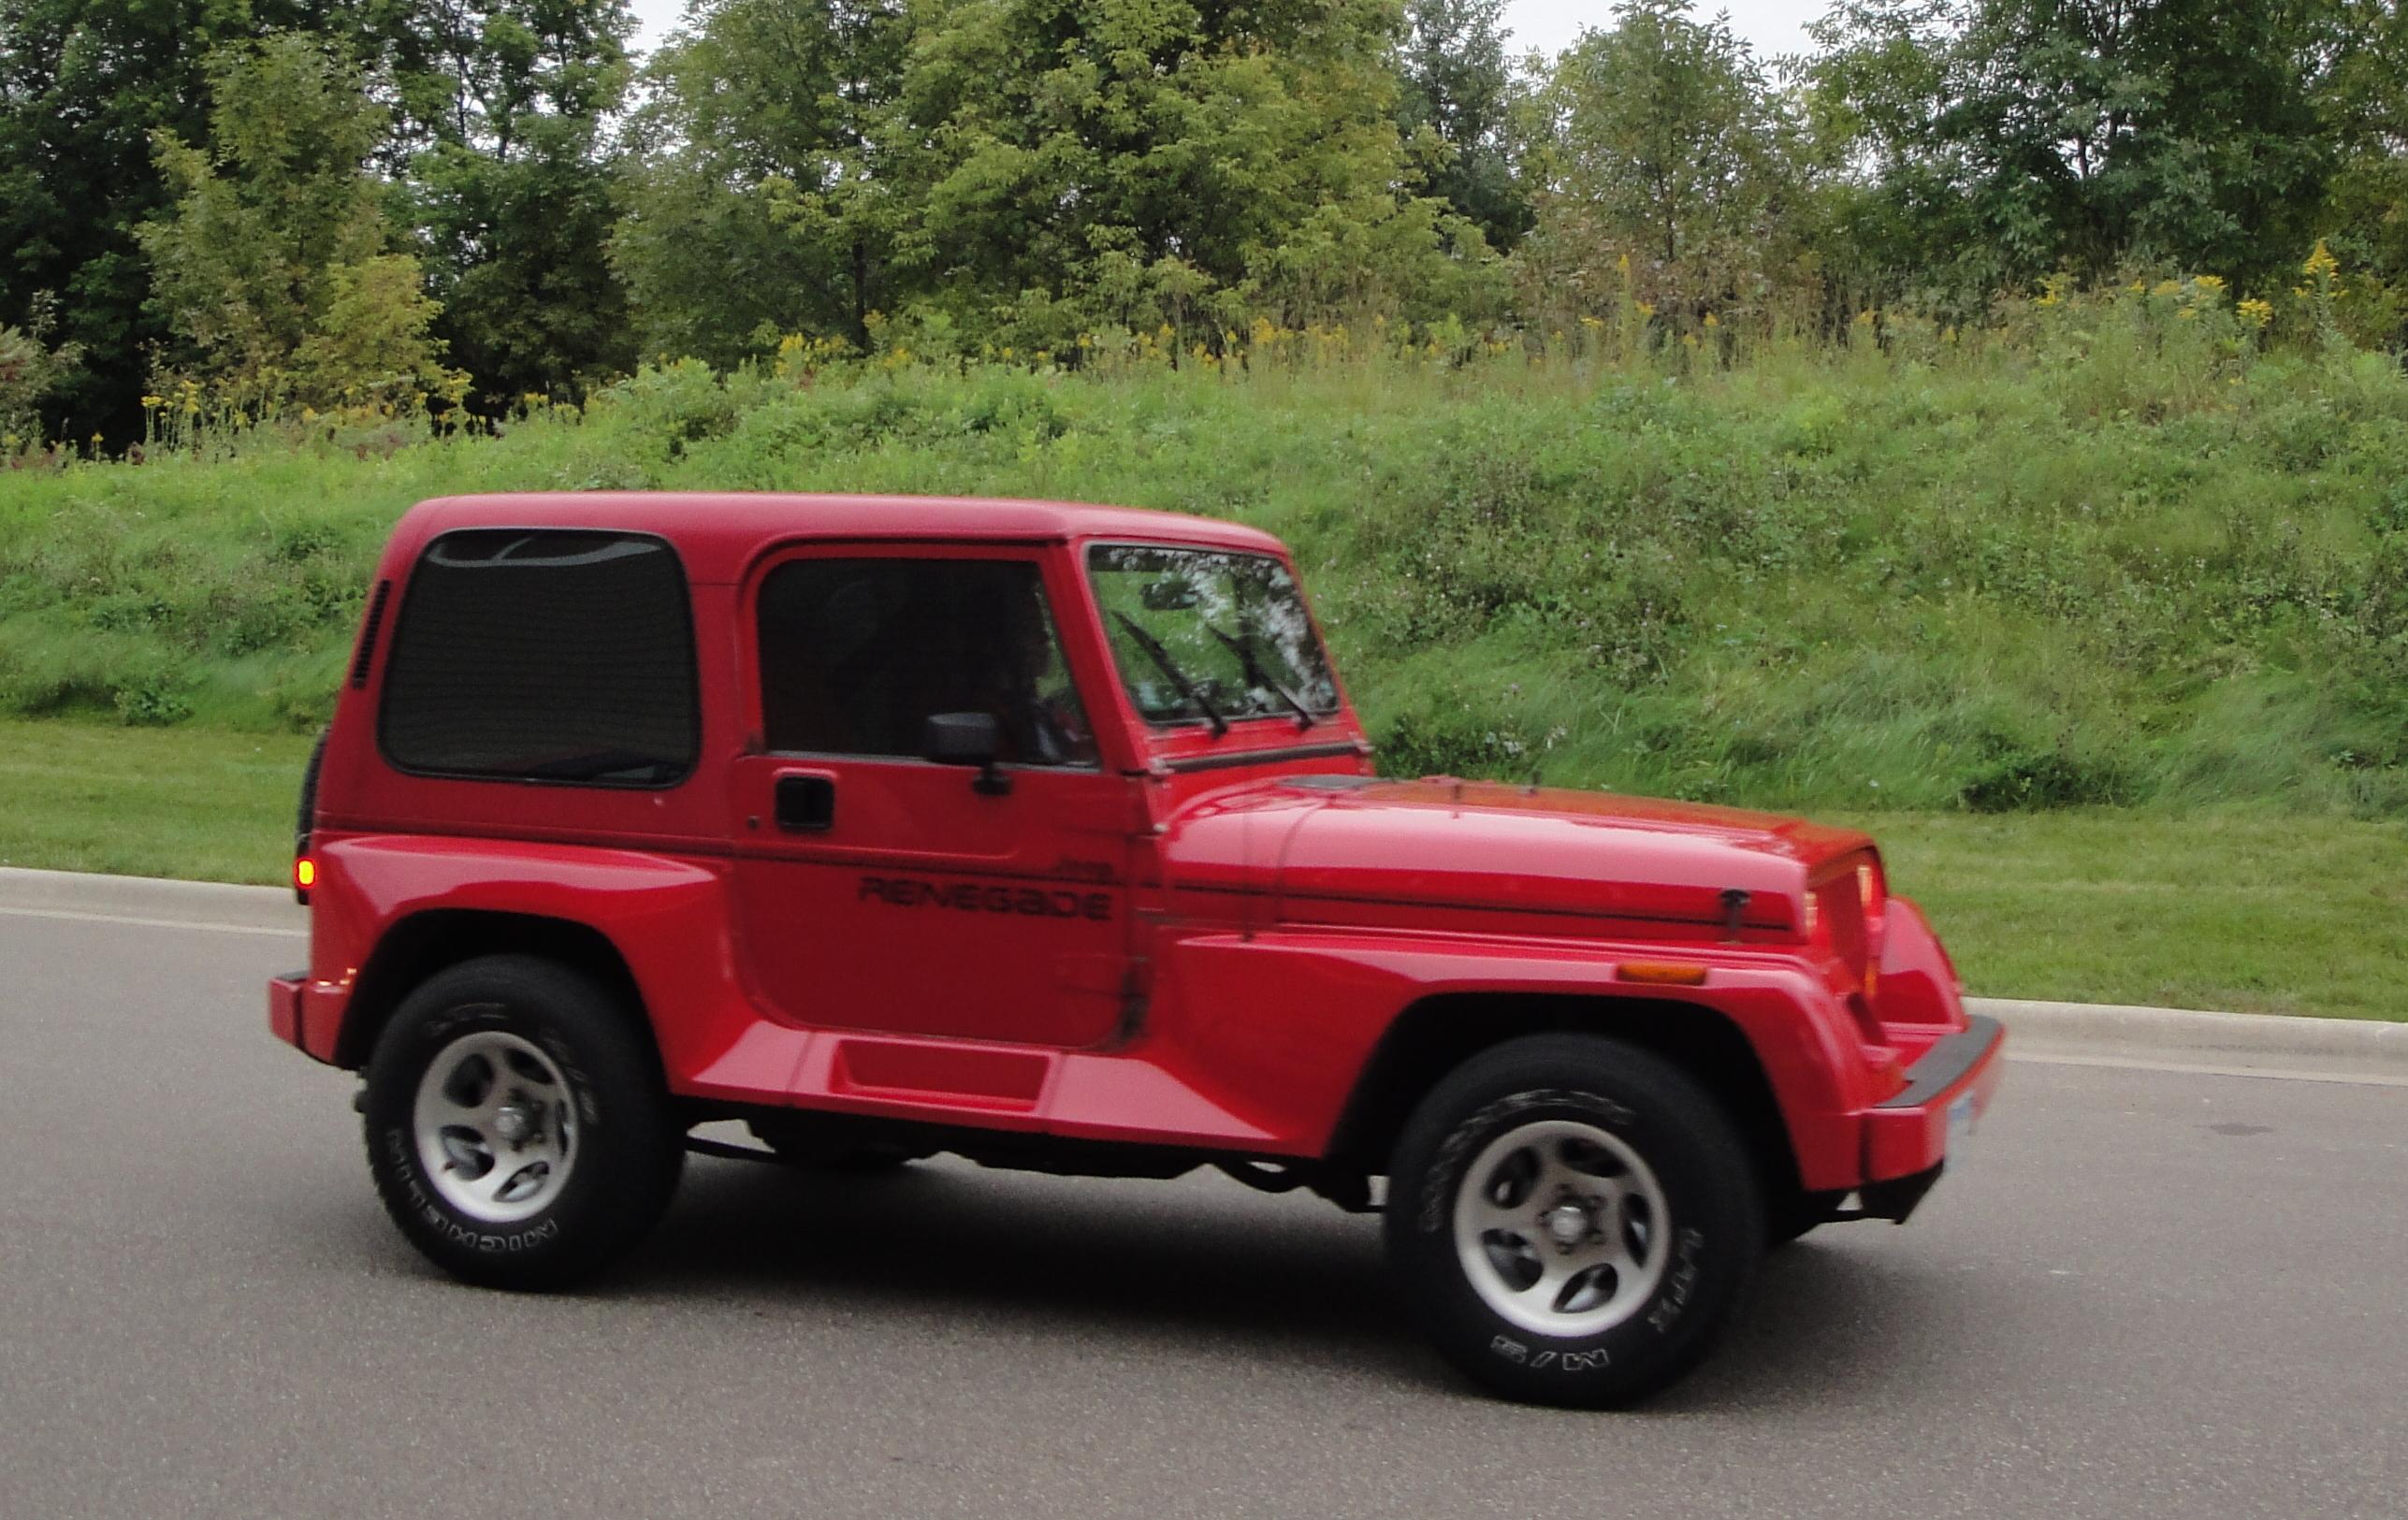 file:91 jeep wrangler renegade (6171038950) - wikimedia commons